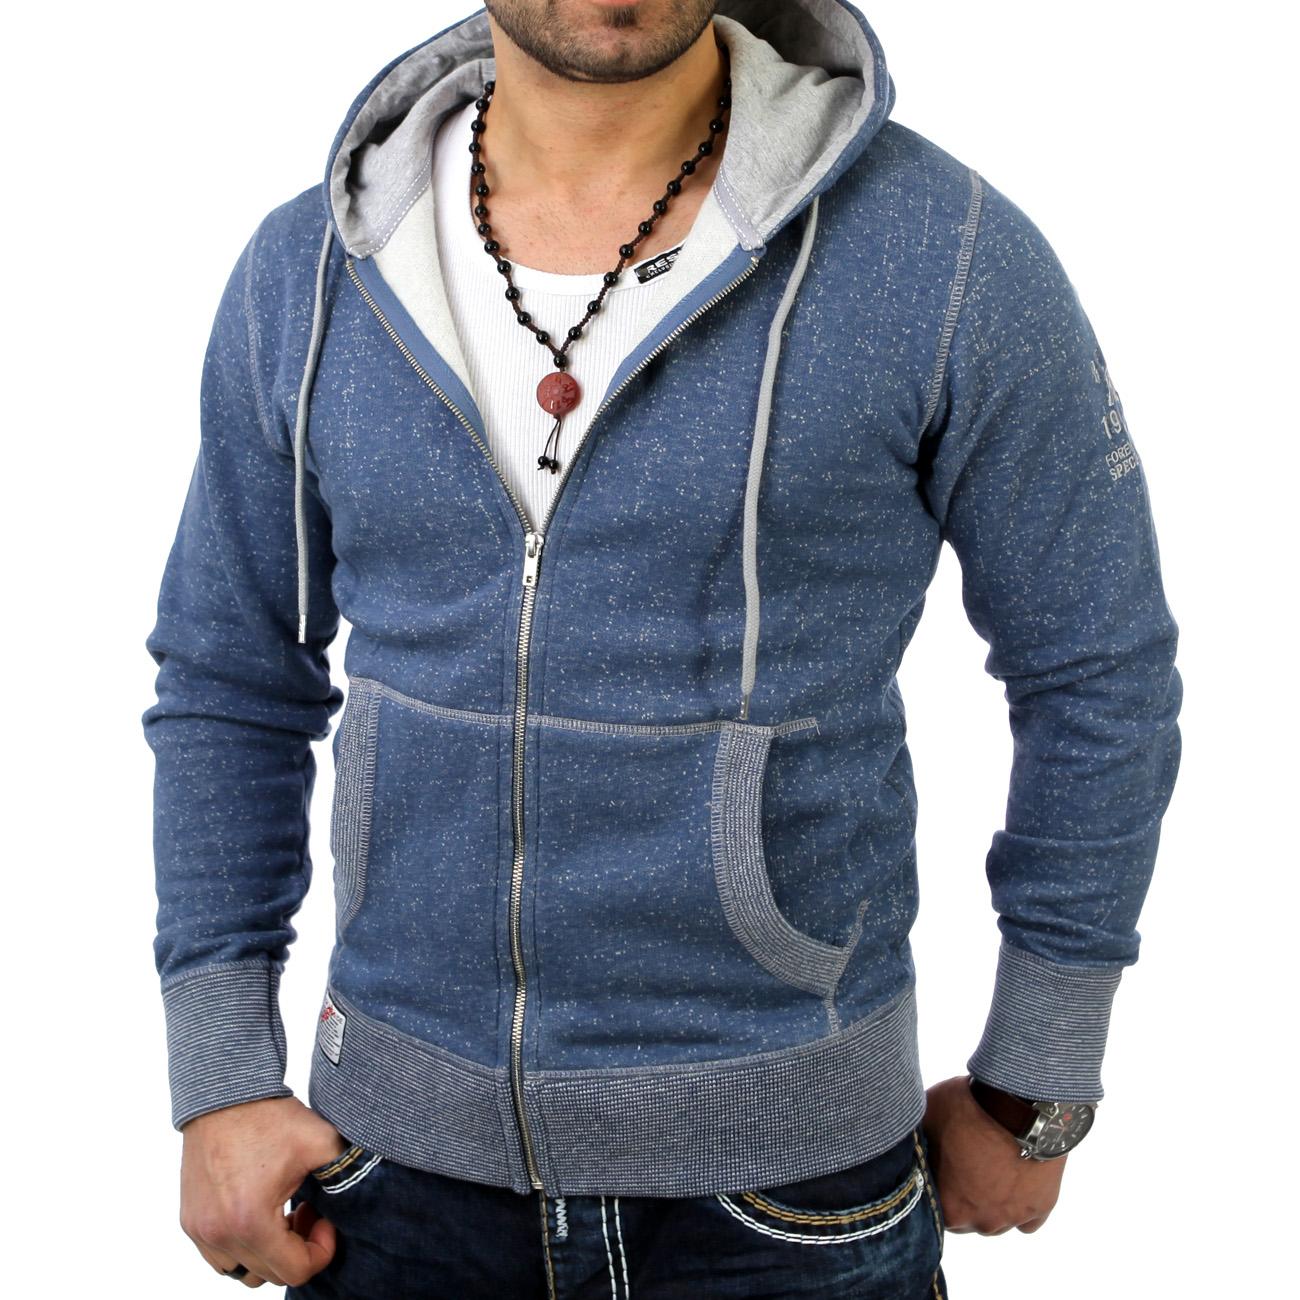 reslad herren kapuzen pulli pullover jacke sweat shirt hoody sweatjacke neuss. Black Bedroom Furniture Sets. Home Design Ideas